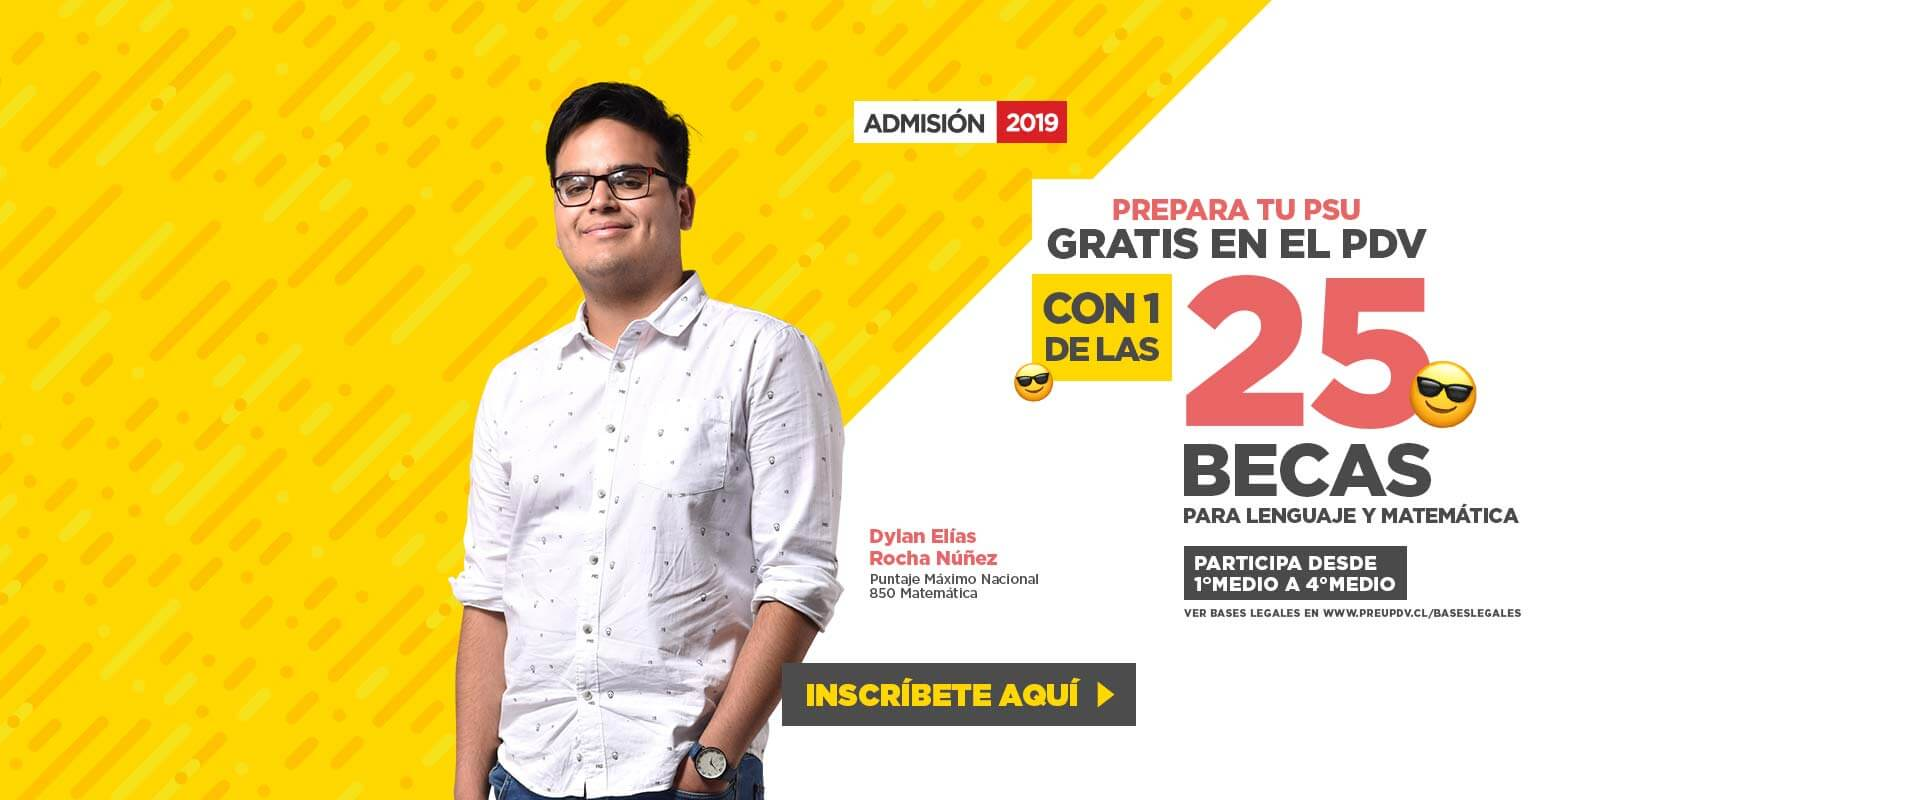 Becas Académicas - Preuniversitario Pedro de Valdivia